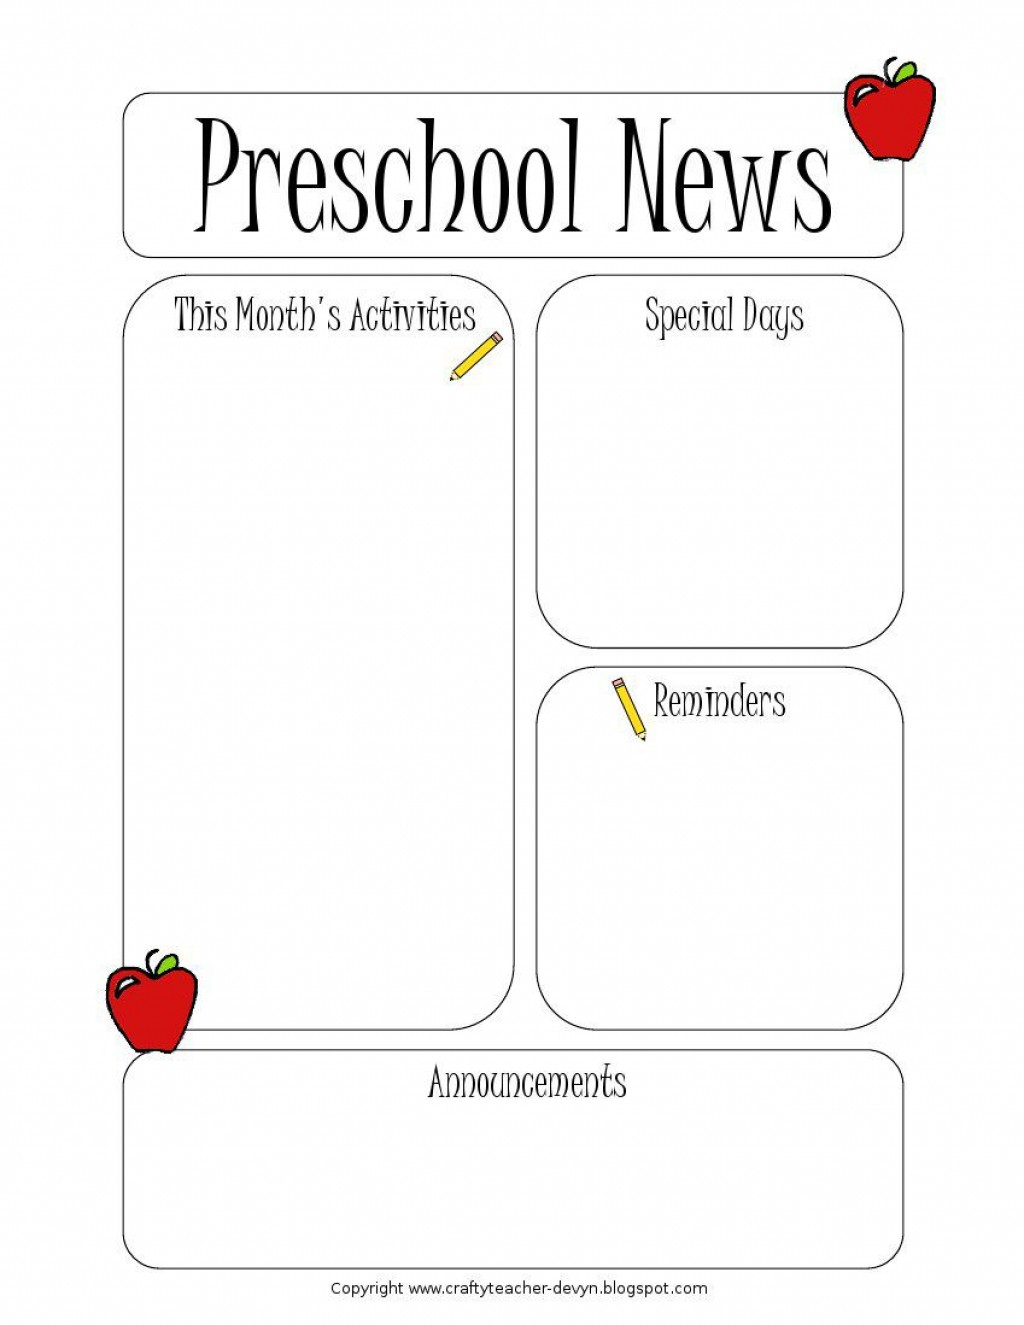 005 Wondrou Newsletter Template For Teacher Inspiration  Teachers To Parent Printable Free SchoolLarge